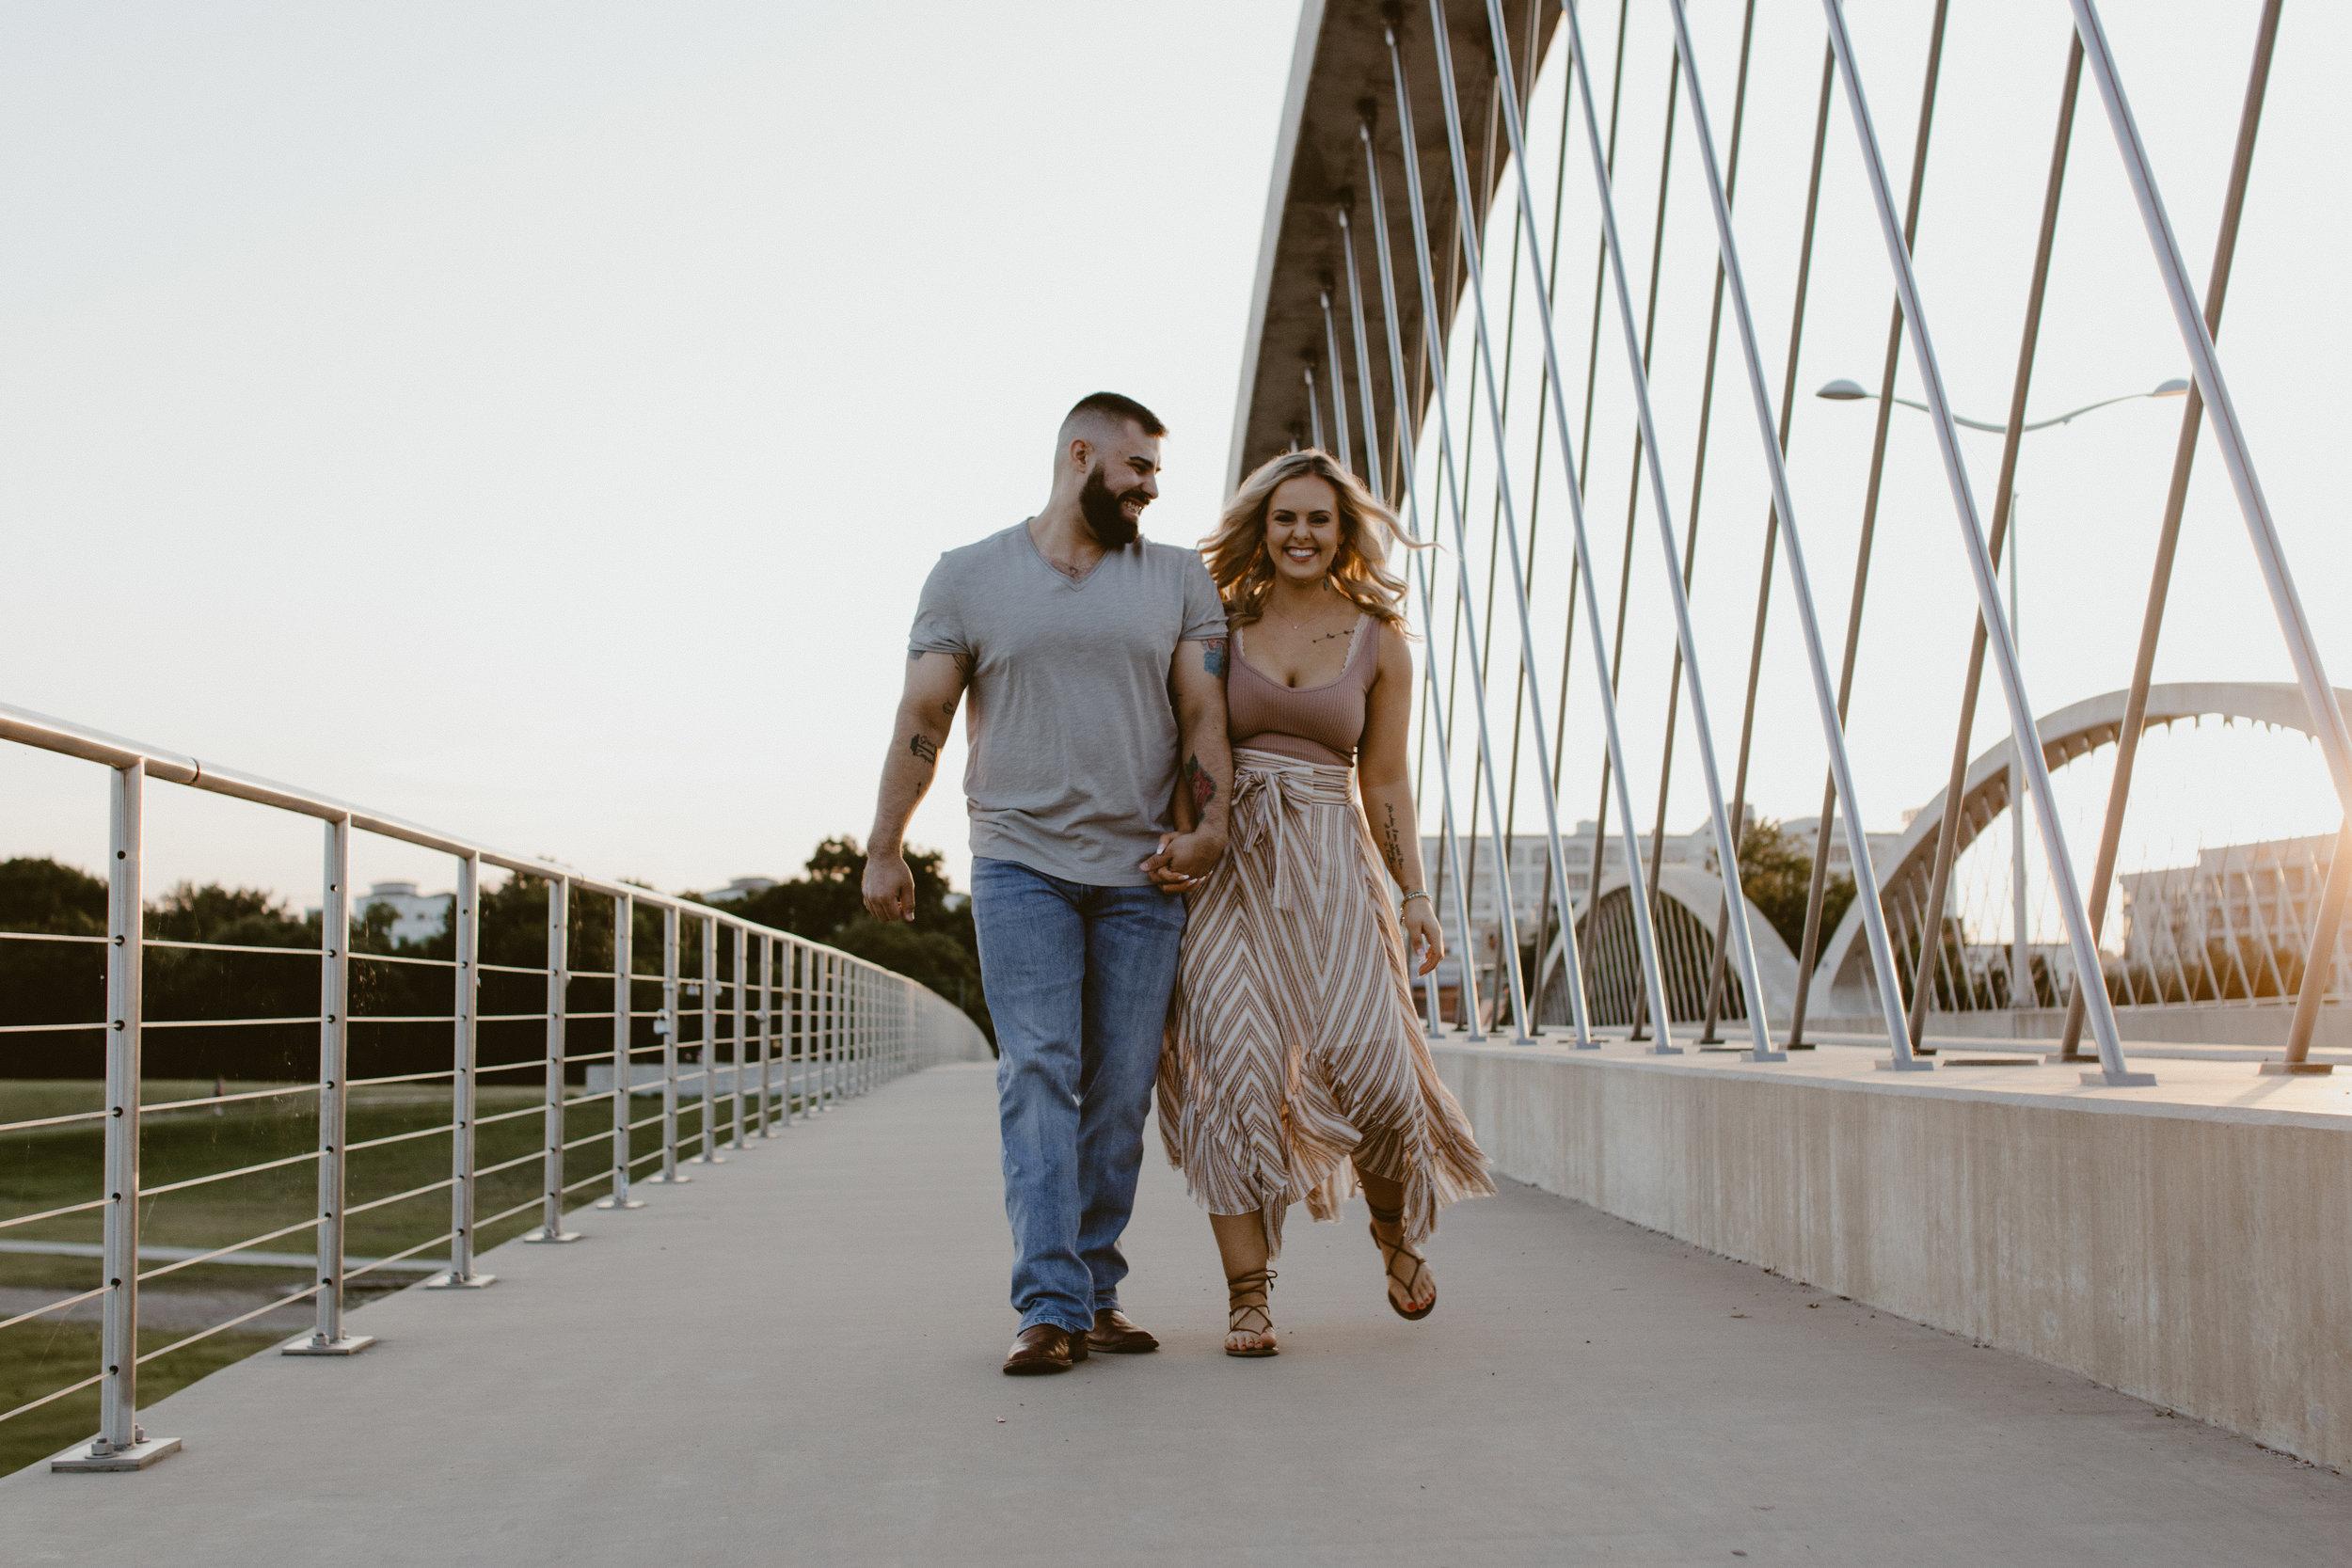 Trinity Park Fort Worth DFW Wedding Photographers12.jpg